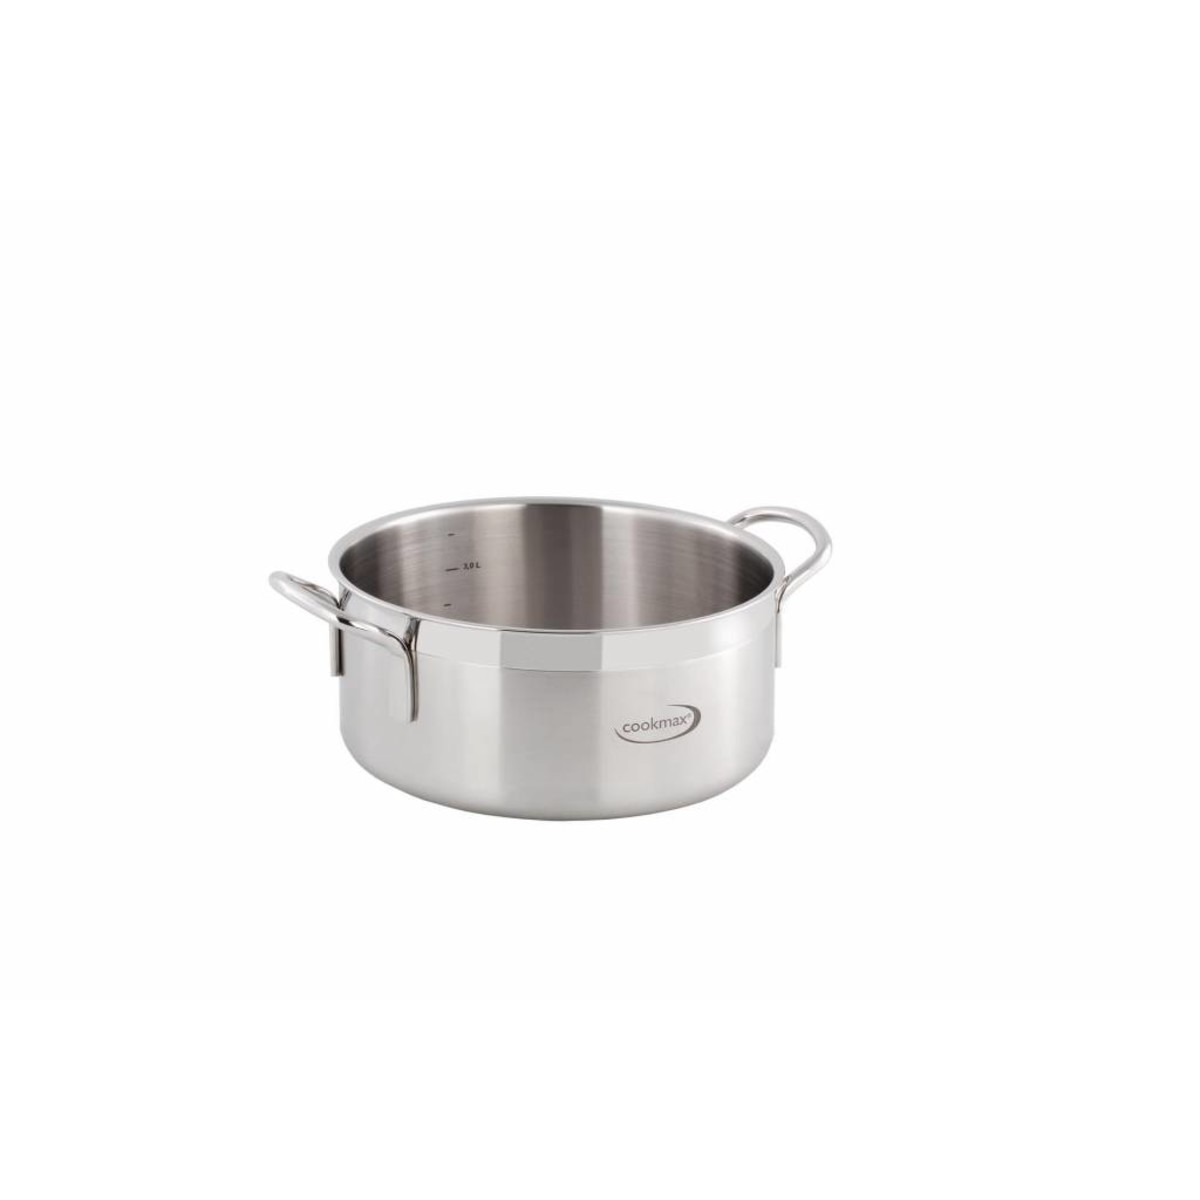 "Bratentopf flach ""Cookmax Gourmet"" Ø 32 cm, H: 15 cm. Inhalt 12L"